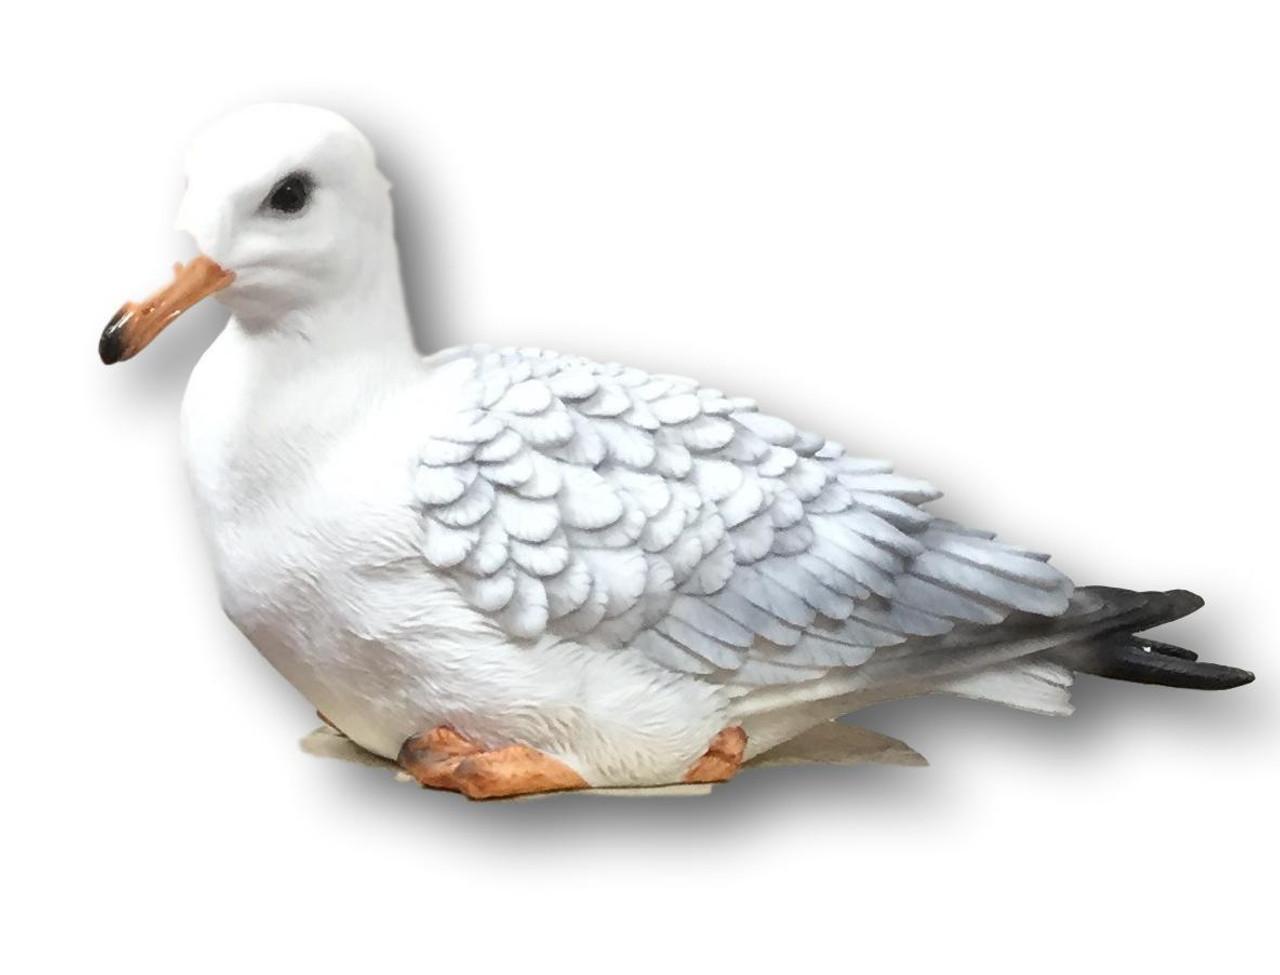 Birds / Pelicans / Blue Herons / Seagulls